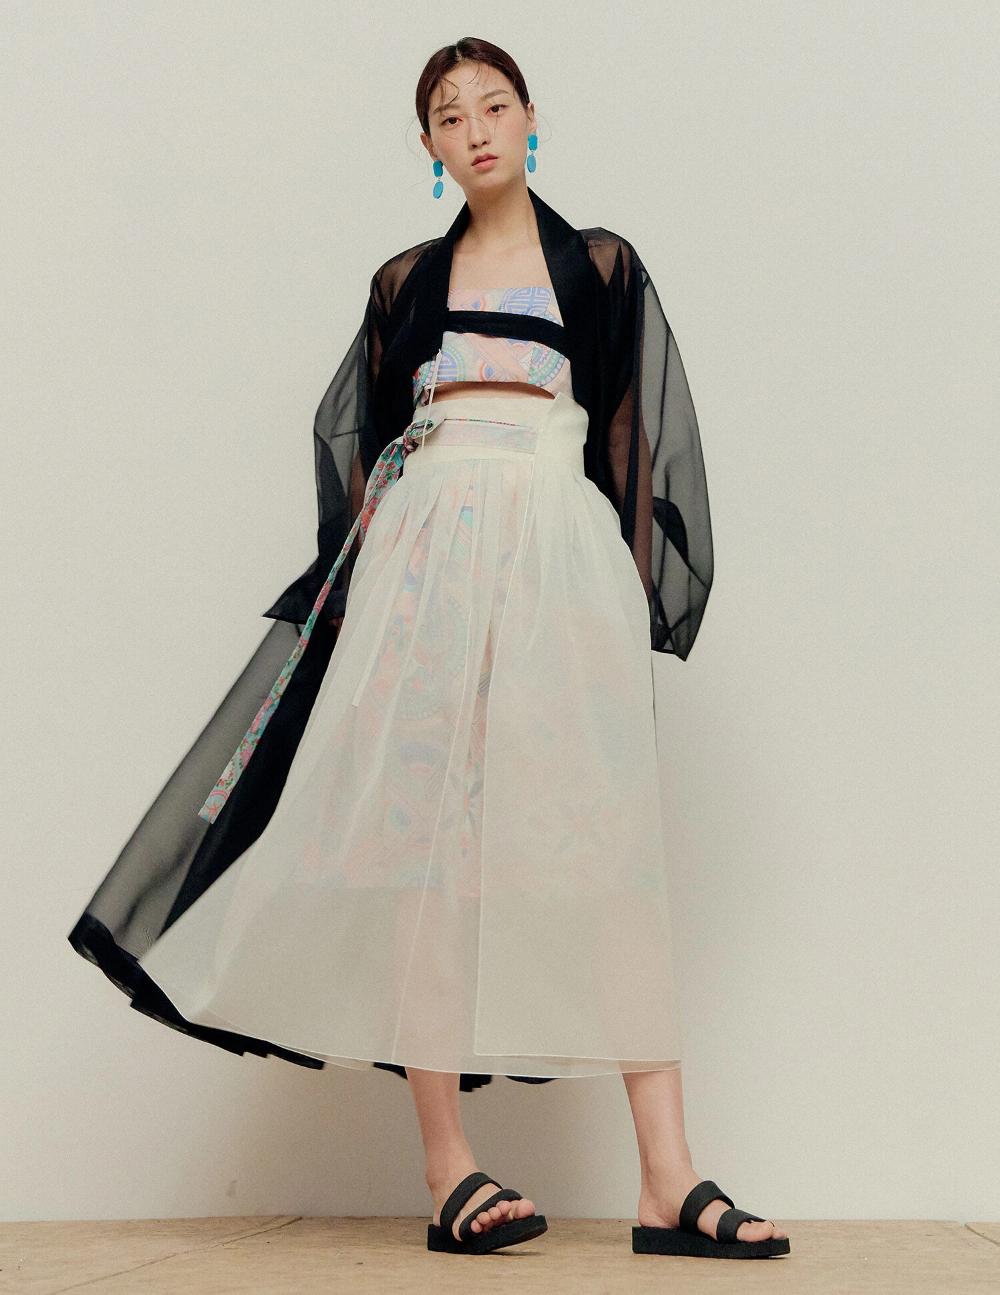 A Centuries-Old Korean Style Gets an Update  Korean fashion